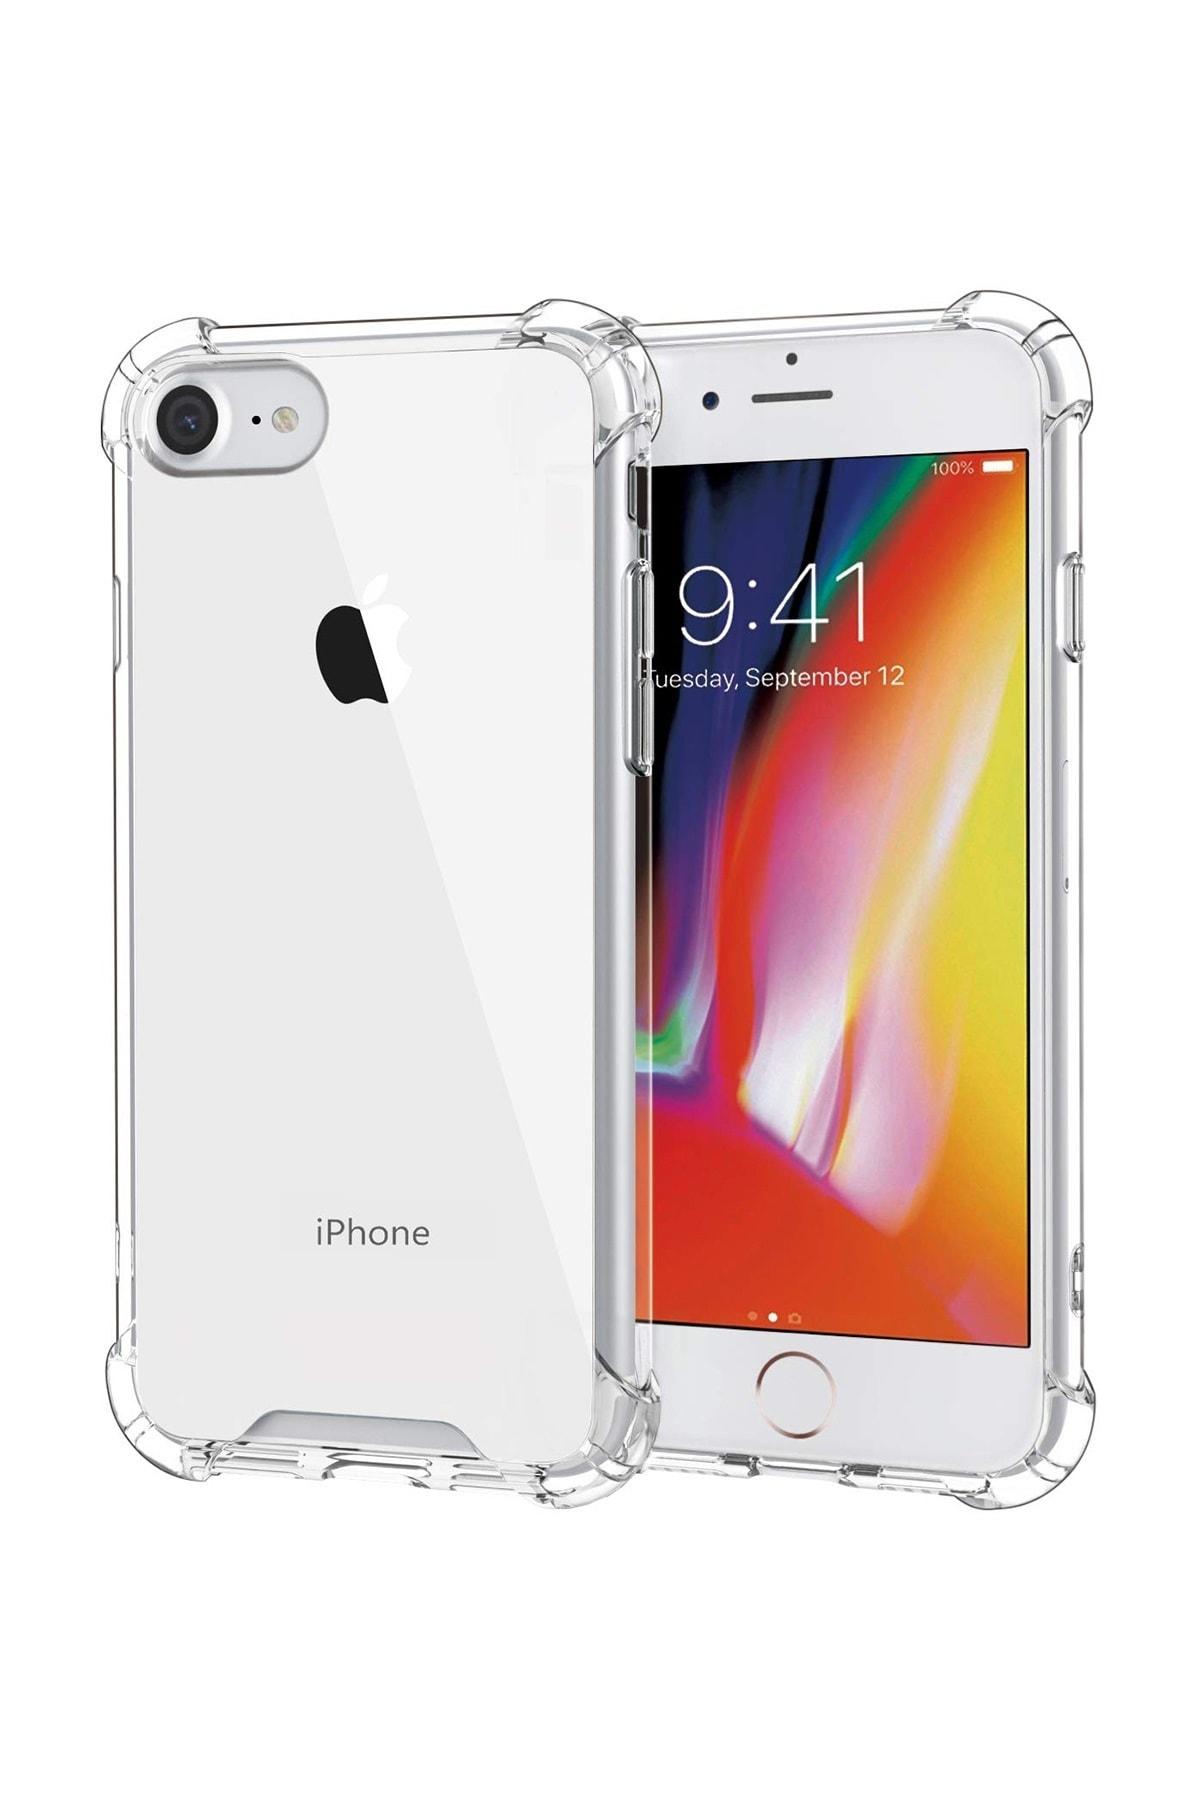 sepetzy Apple Iphone 8 Kılıf Köşe Korumalı Antishock Airbag Şeffaf Kapak 1